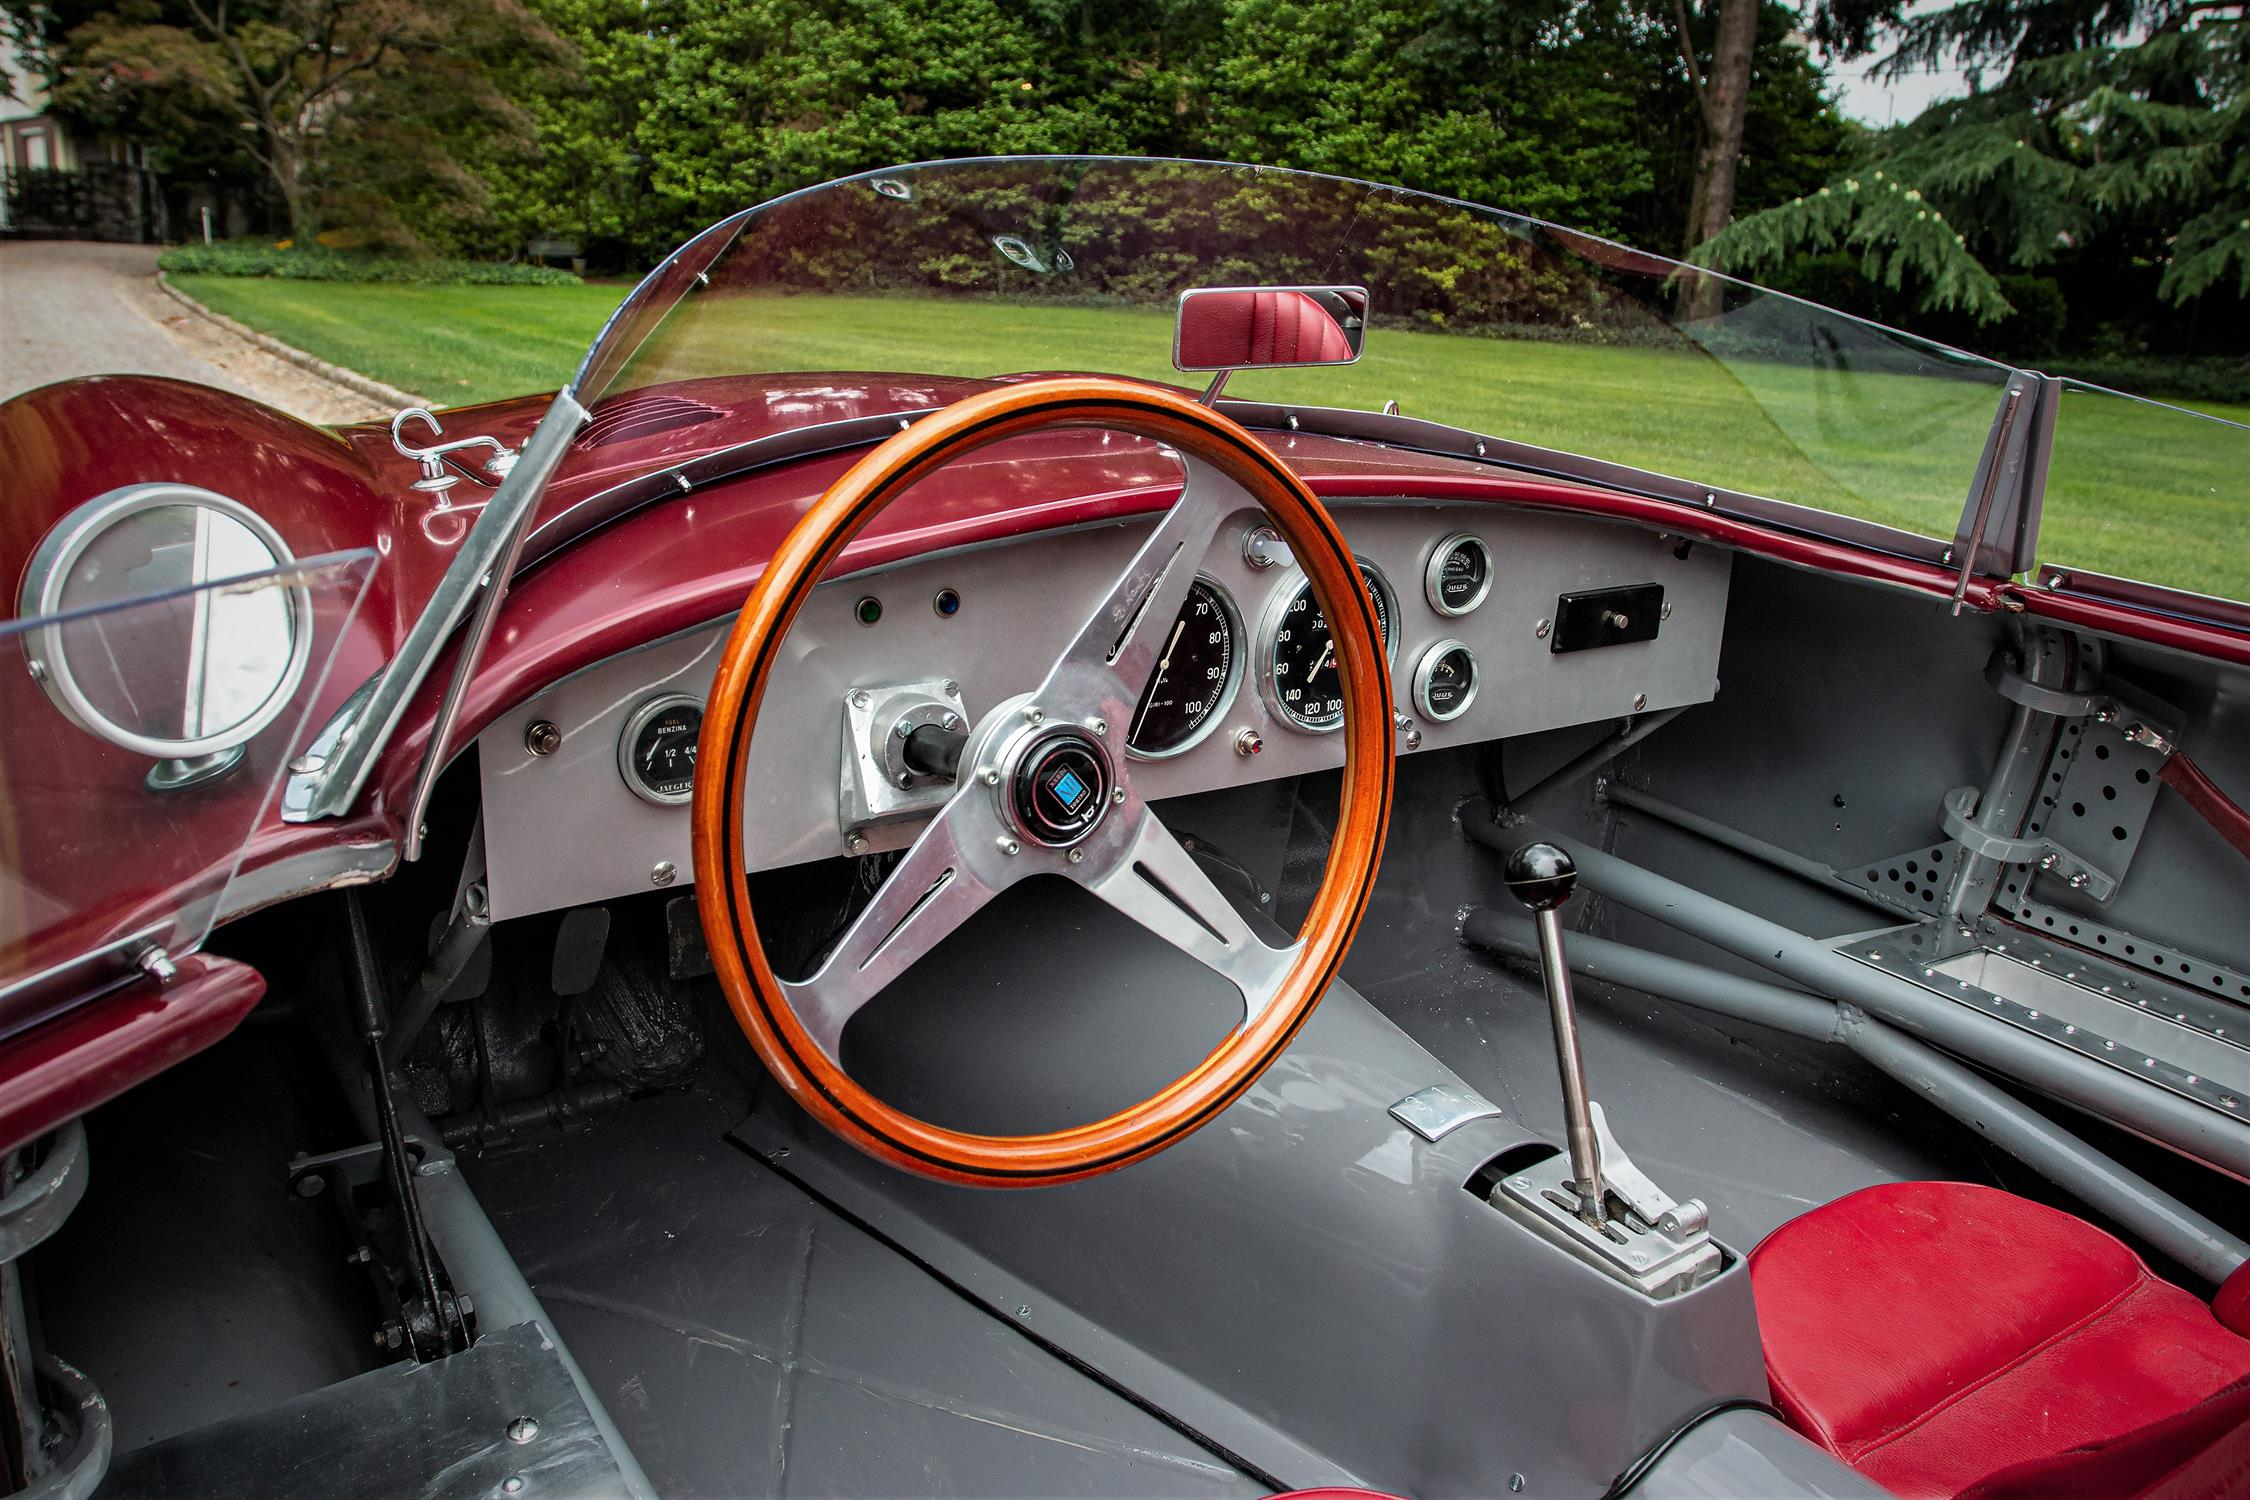 1952 Alfa 1900 ATL Barchetta - Image 7 of 10